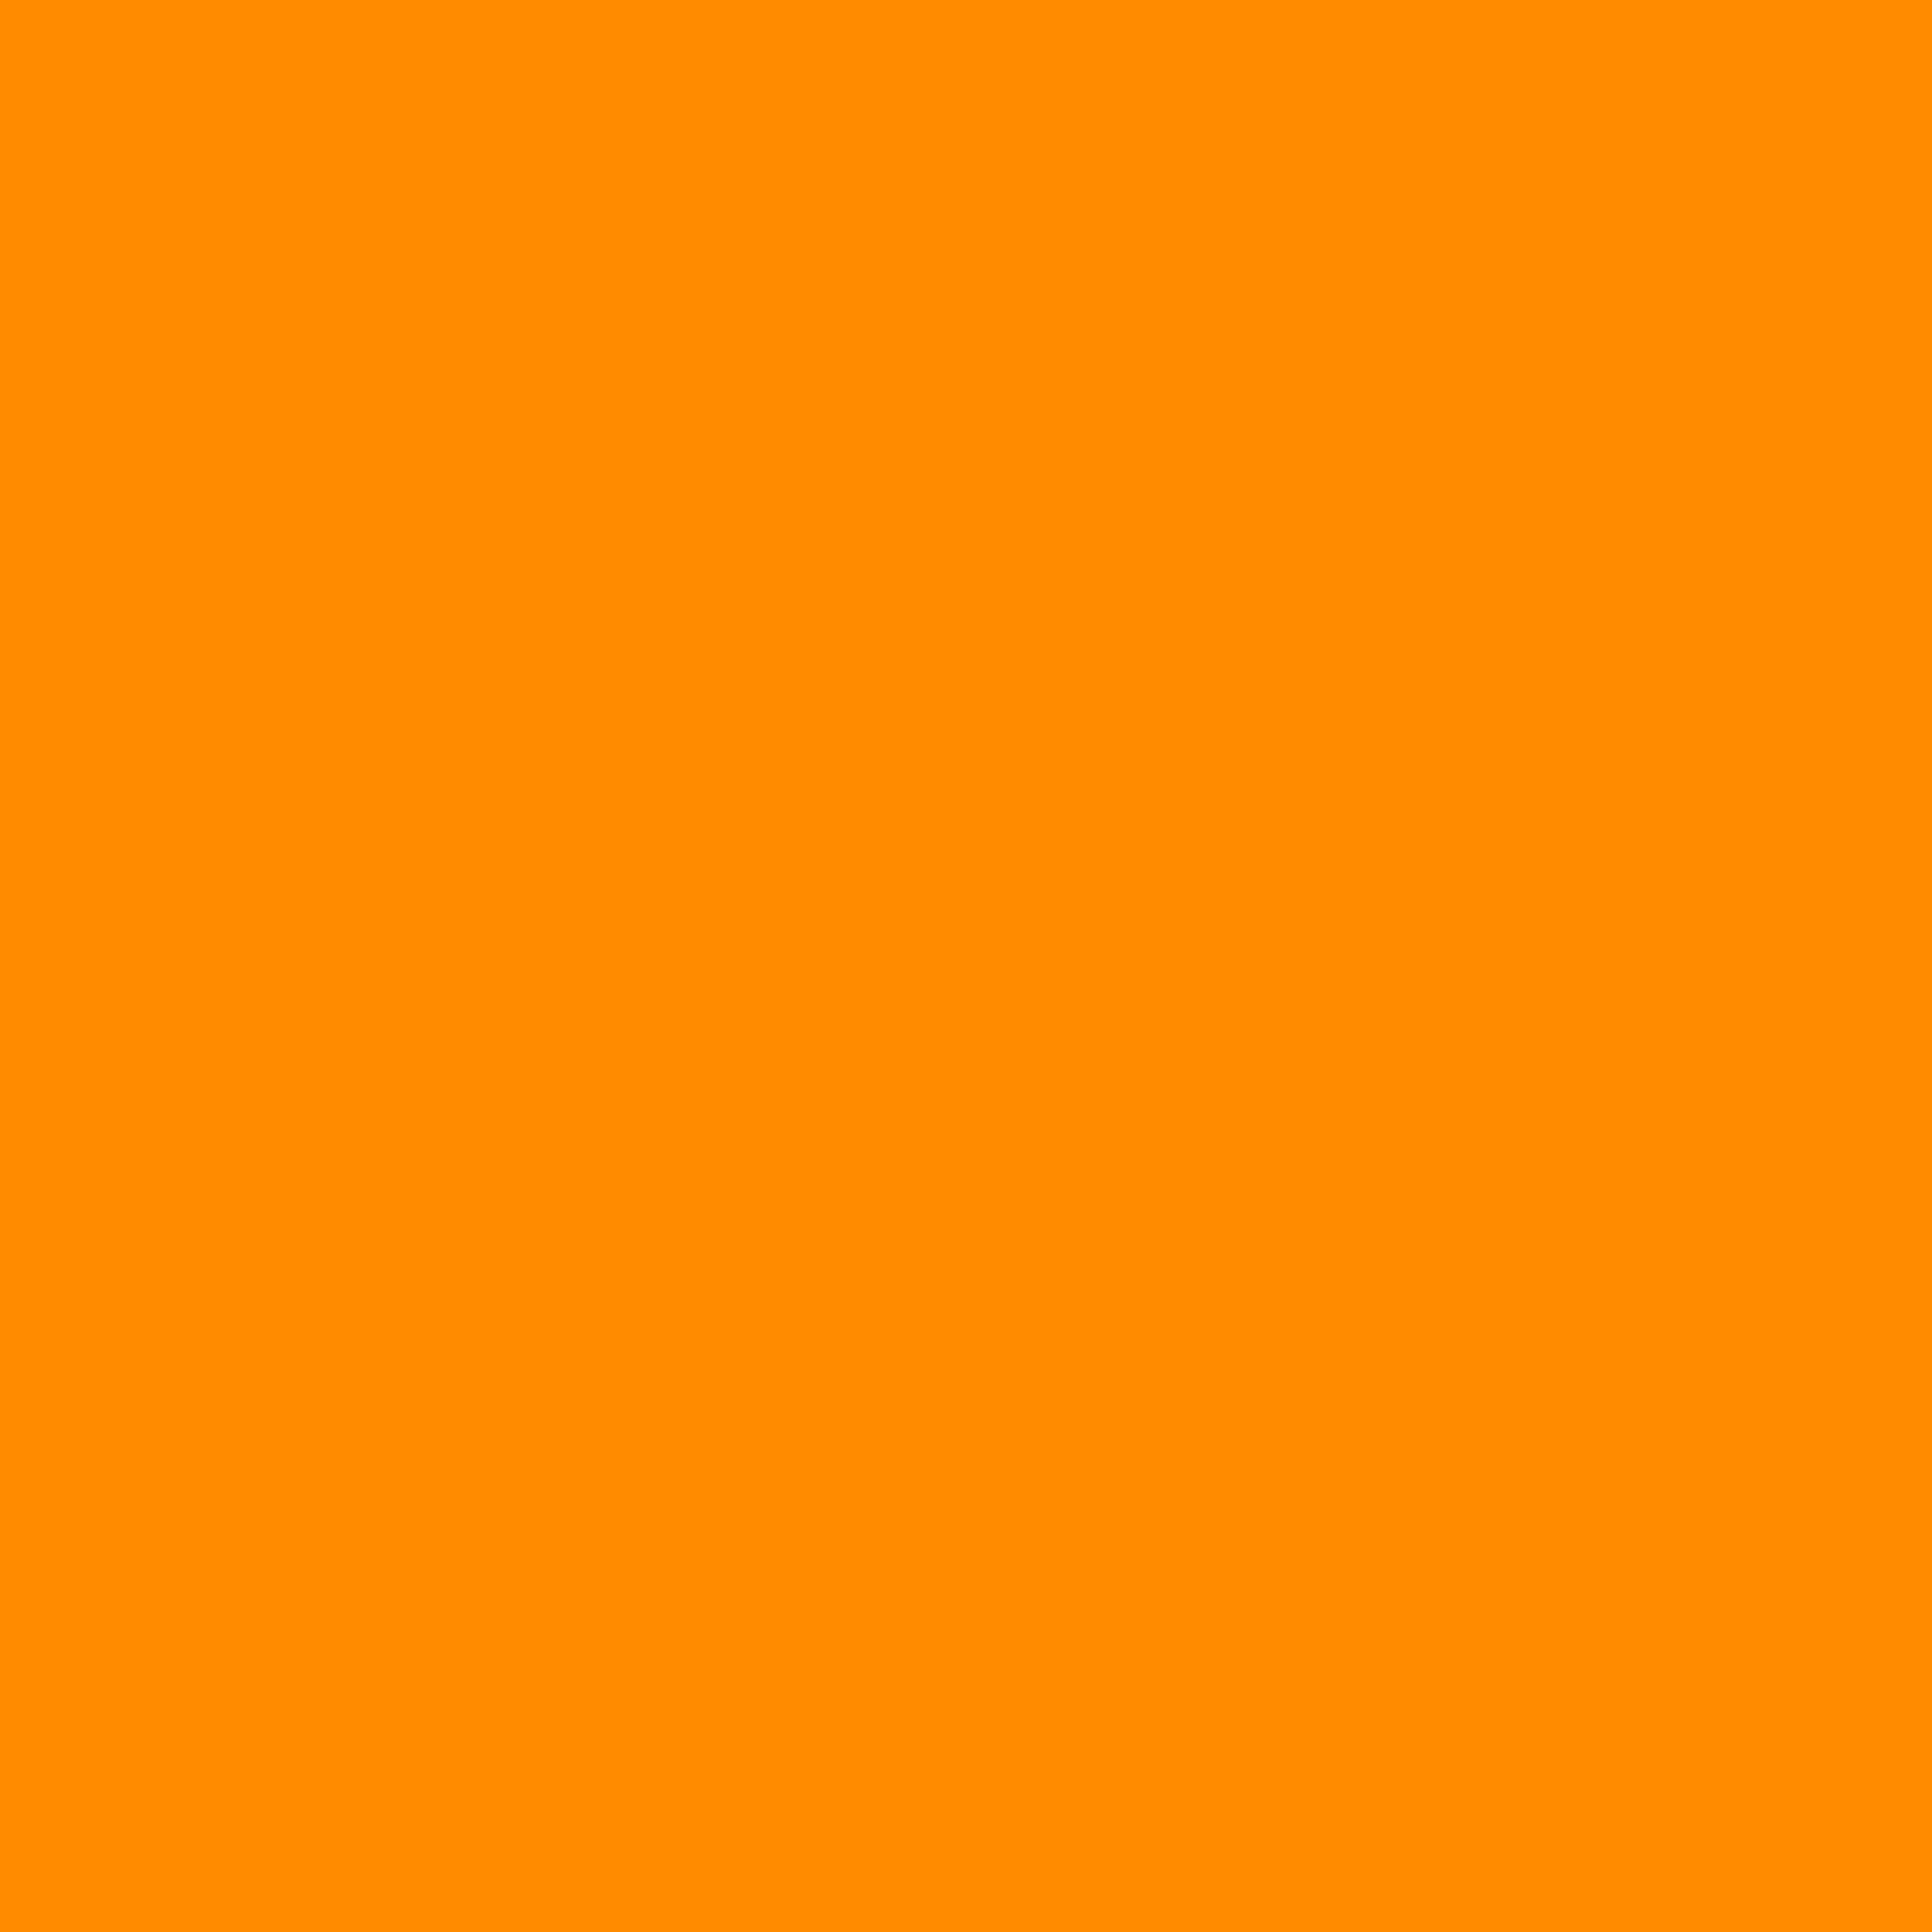 3600x3600 Dark Orange Solid Color Background